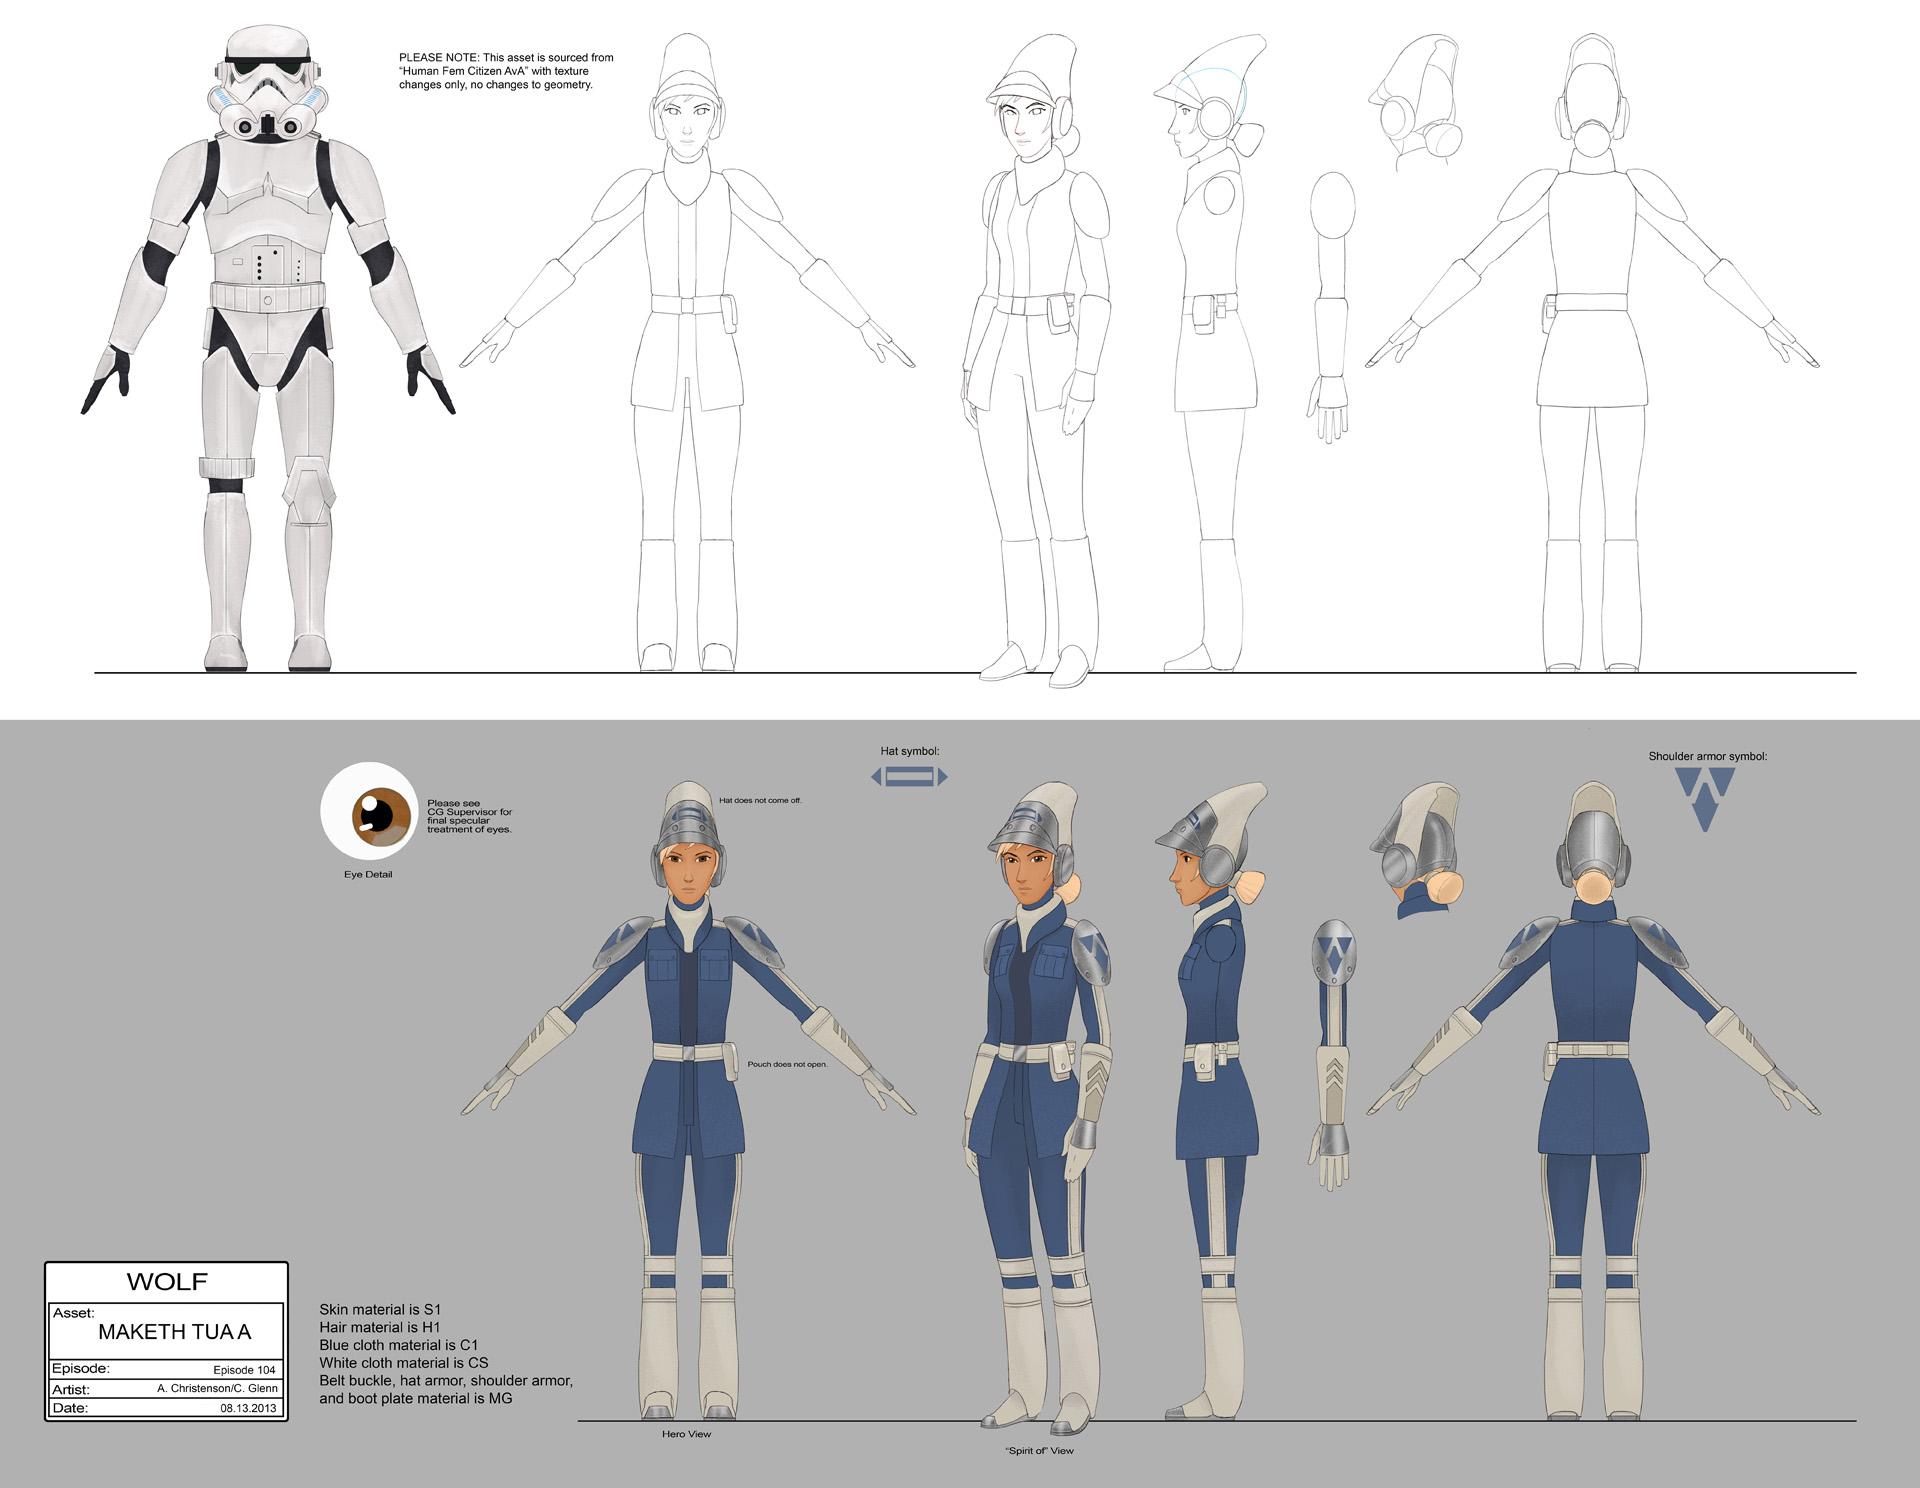 Maketh_Tua_full_character_illustration.jpeg